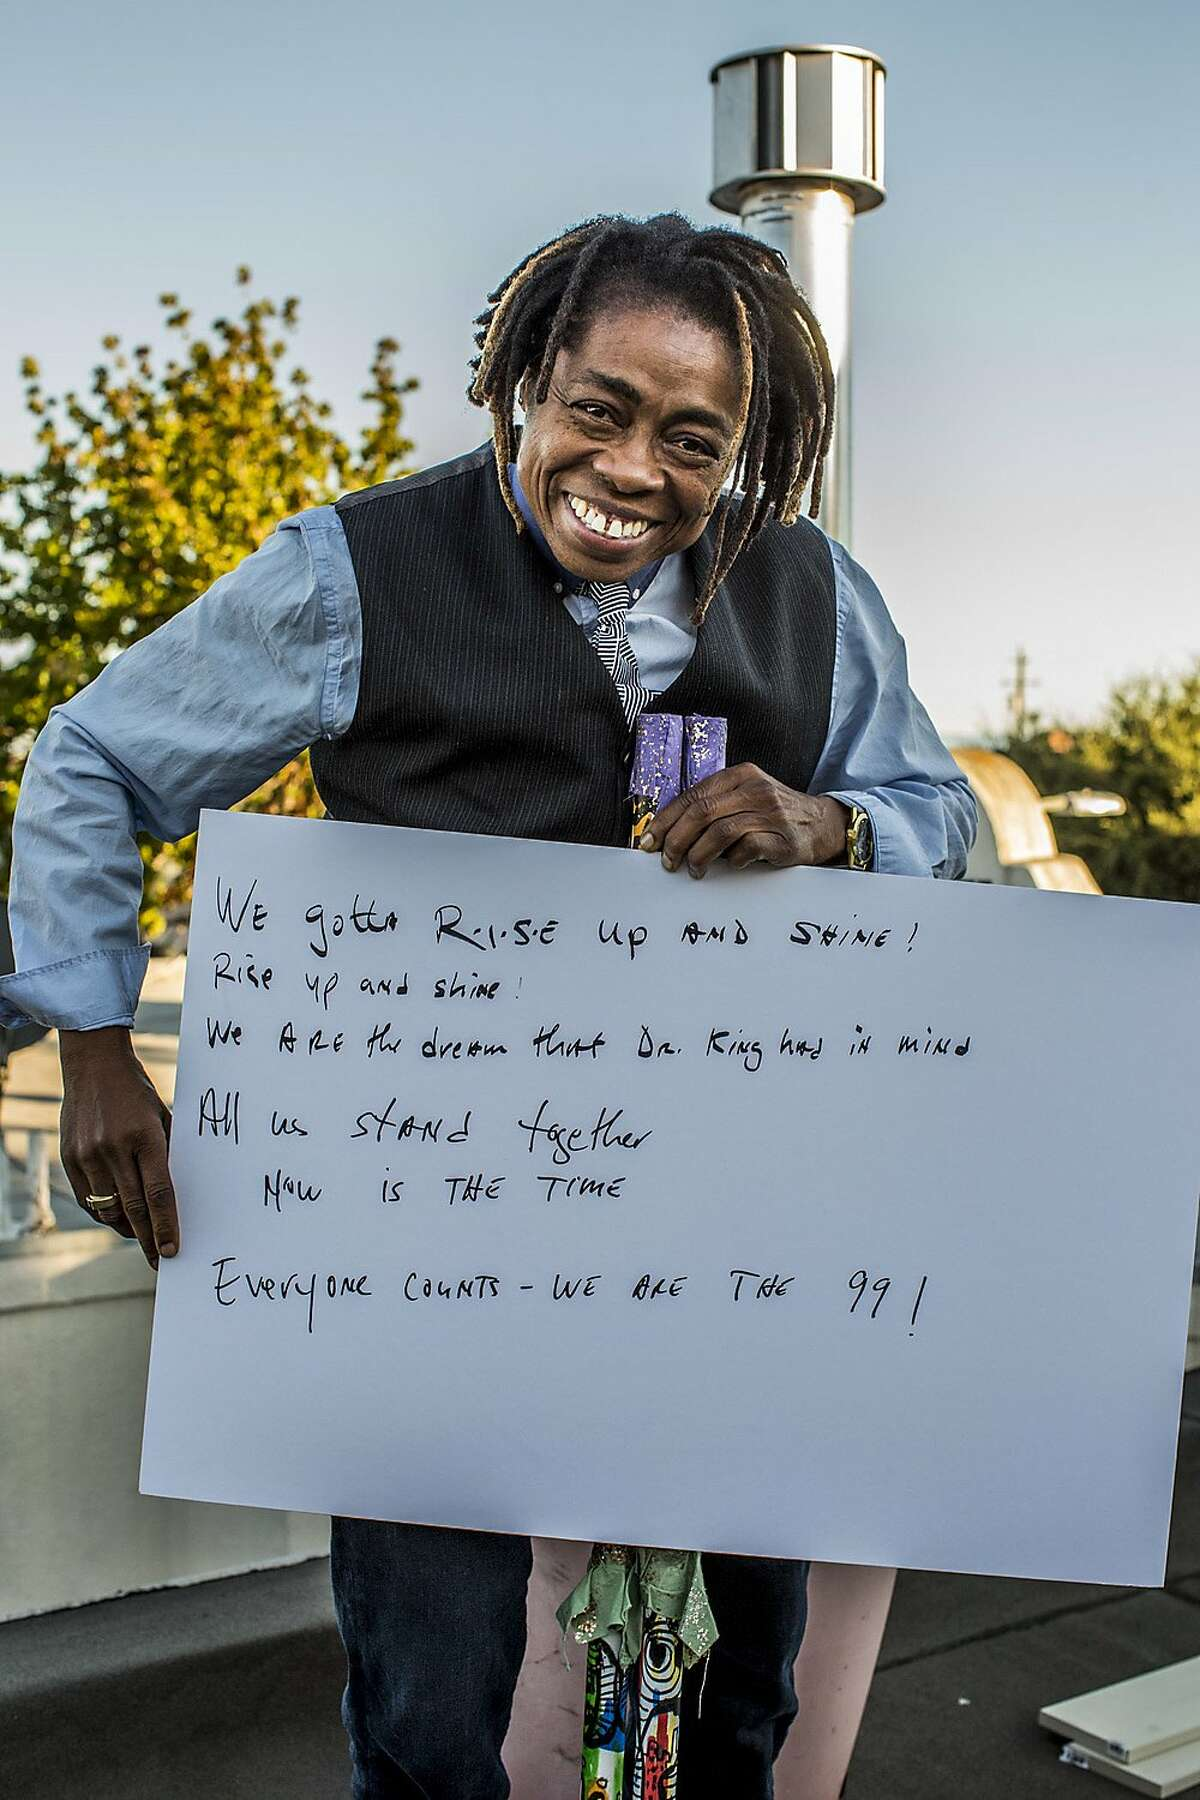 Melanie DeMore, singer, composer, lives in Oakland's Clinton neighborhood